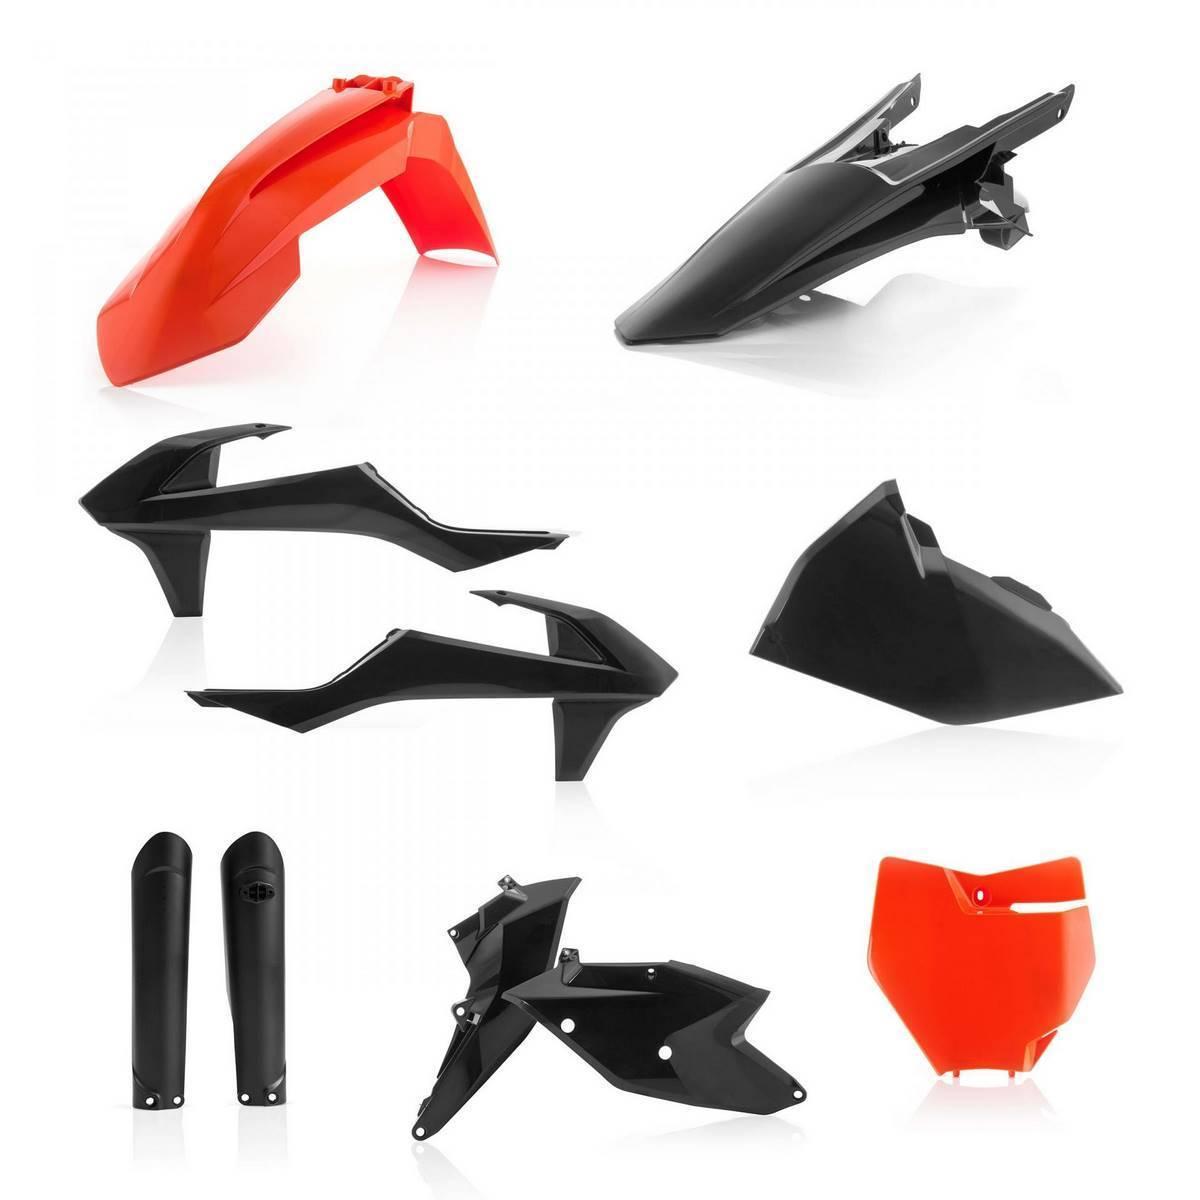 0021741-011 - Full Kit Plasticos Sxf 16 18 Naranja Negro